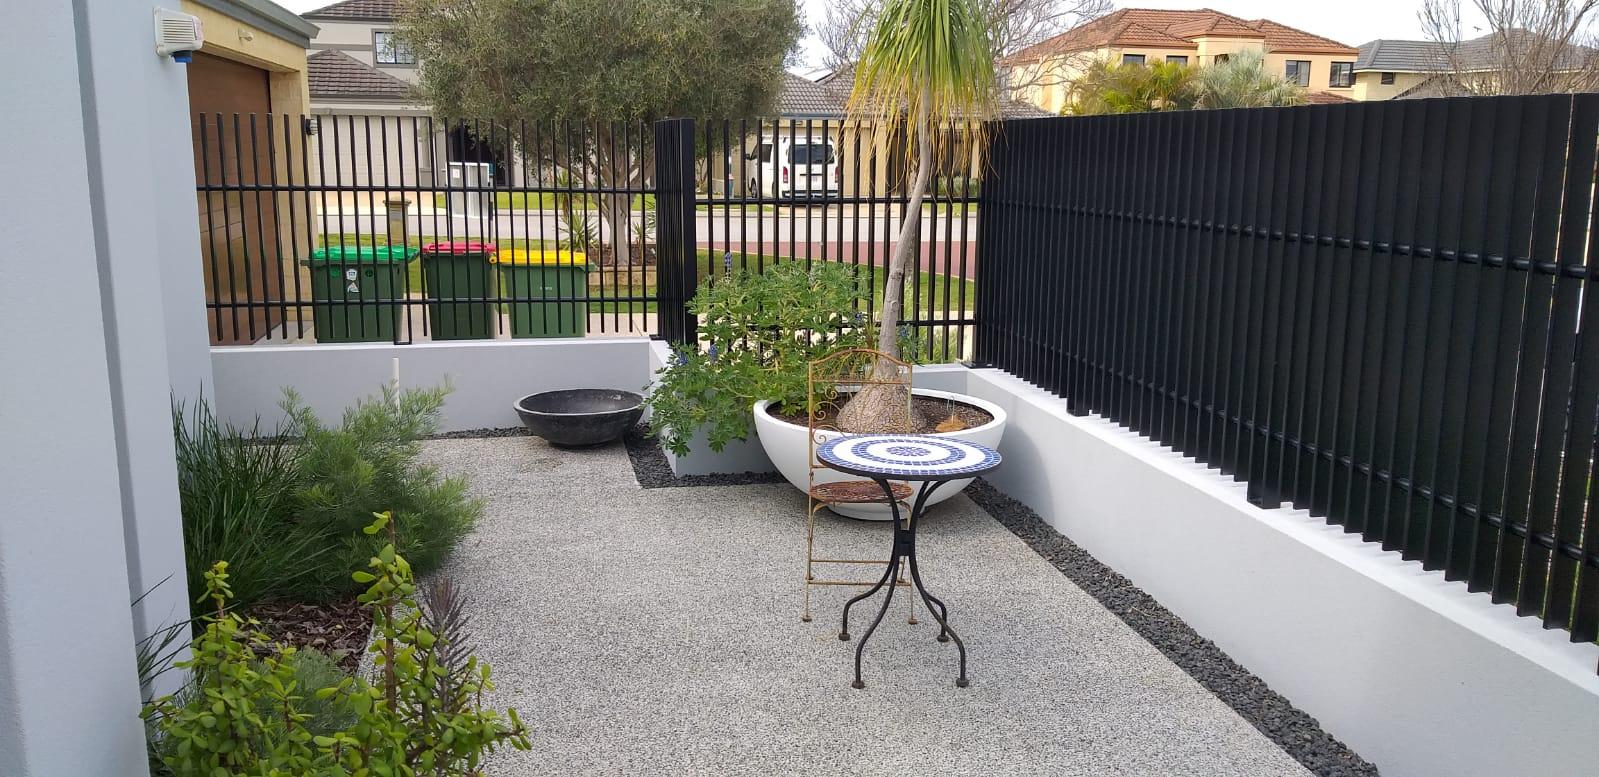 Aluminium Whitby blade fence - black 1